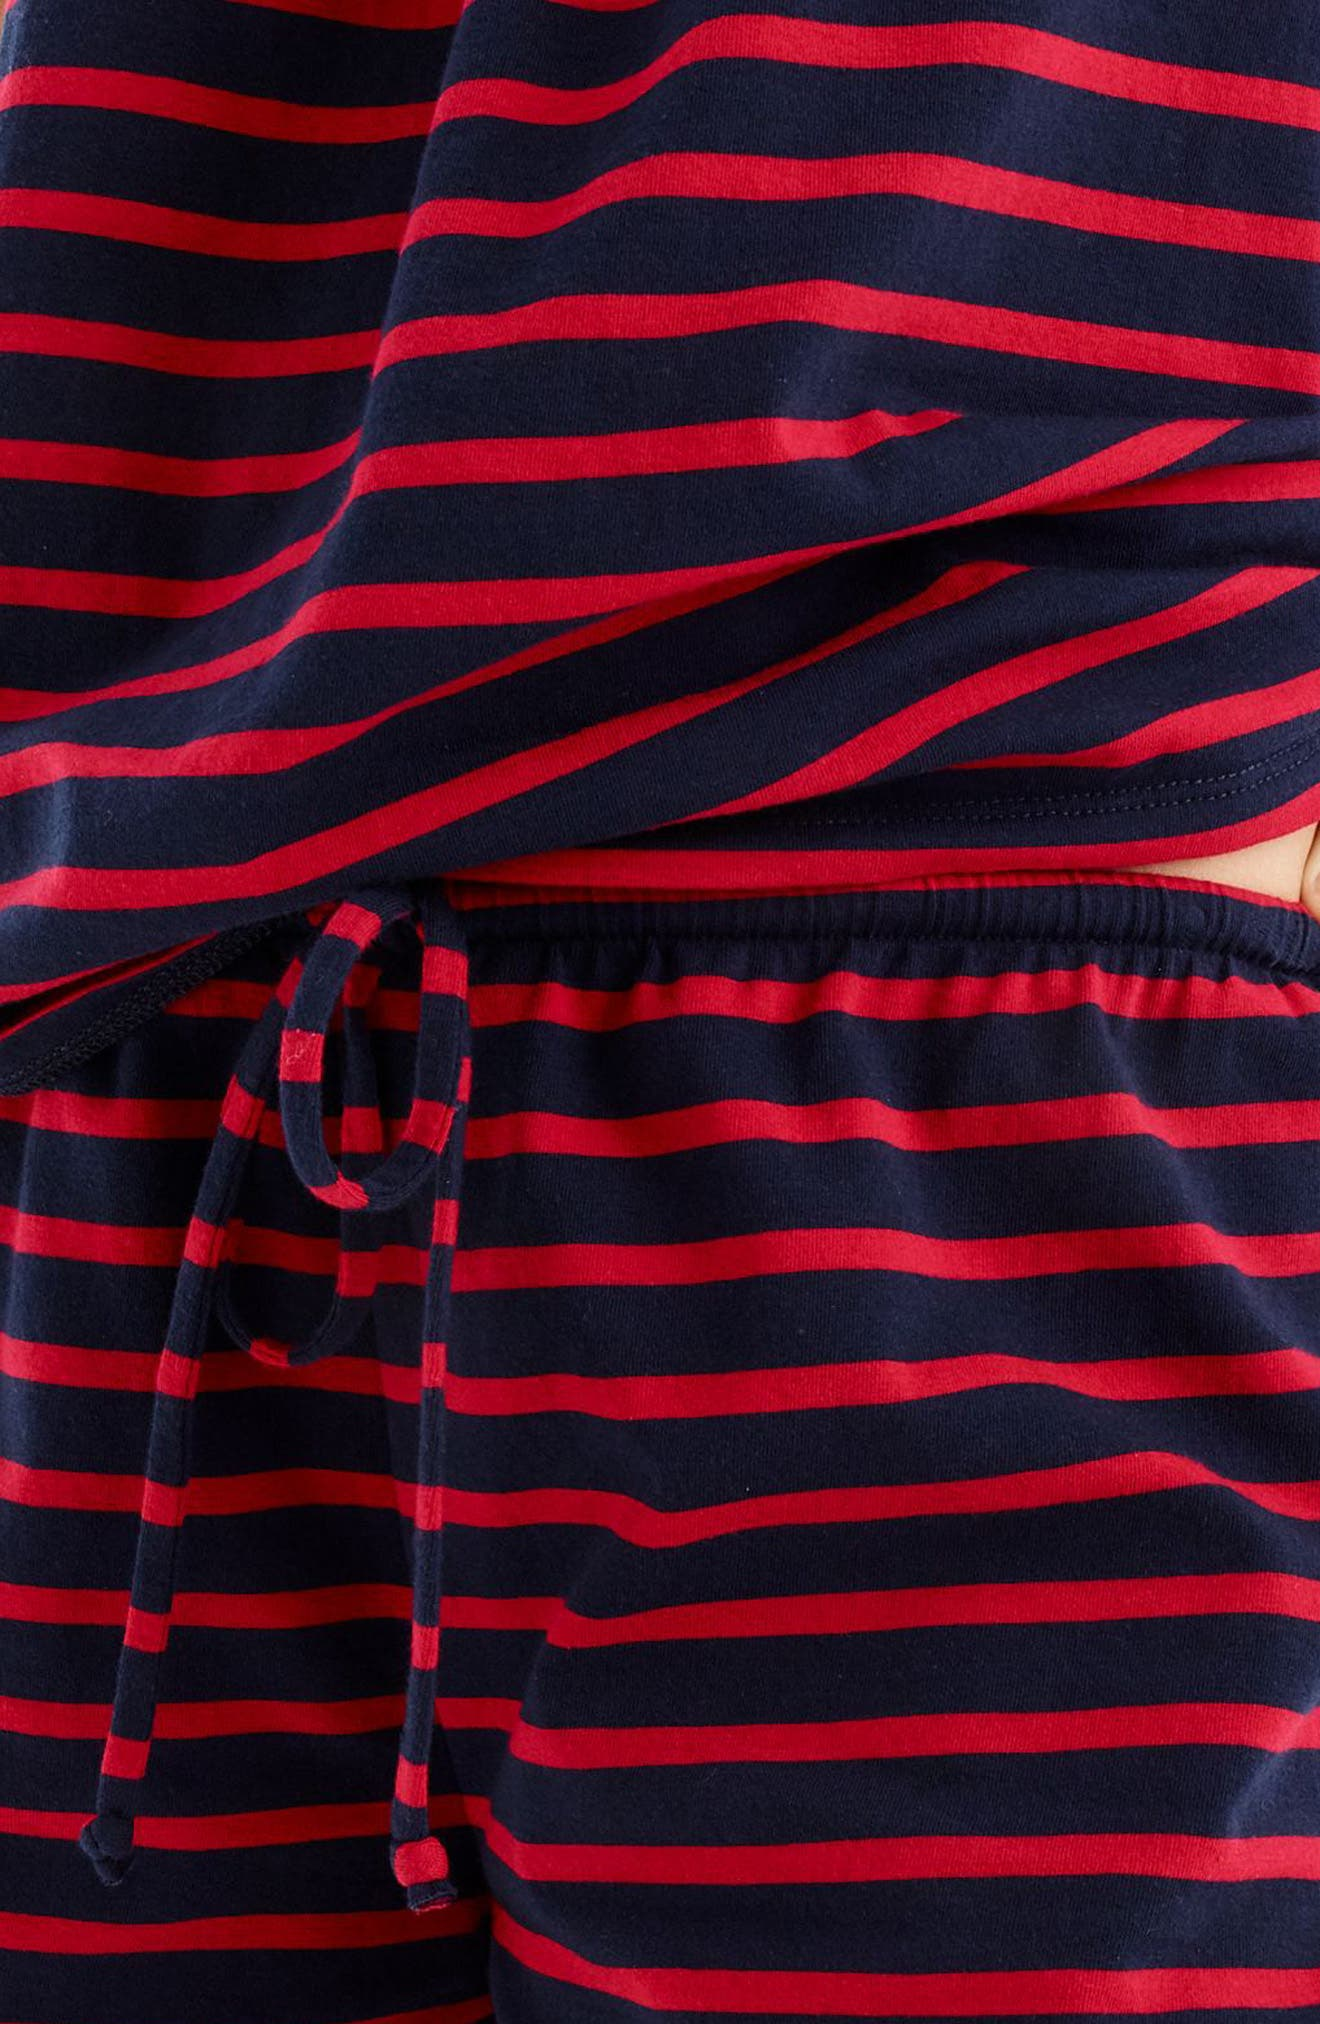 Stripe Short Pajamas,                             Alternate thumbnail 4, color,                             Navy Red